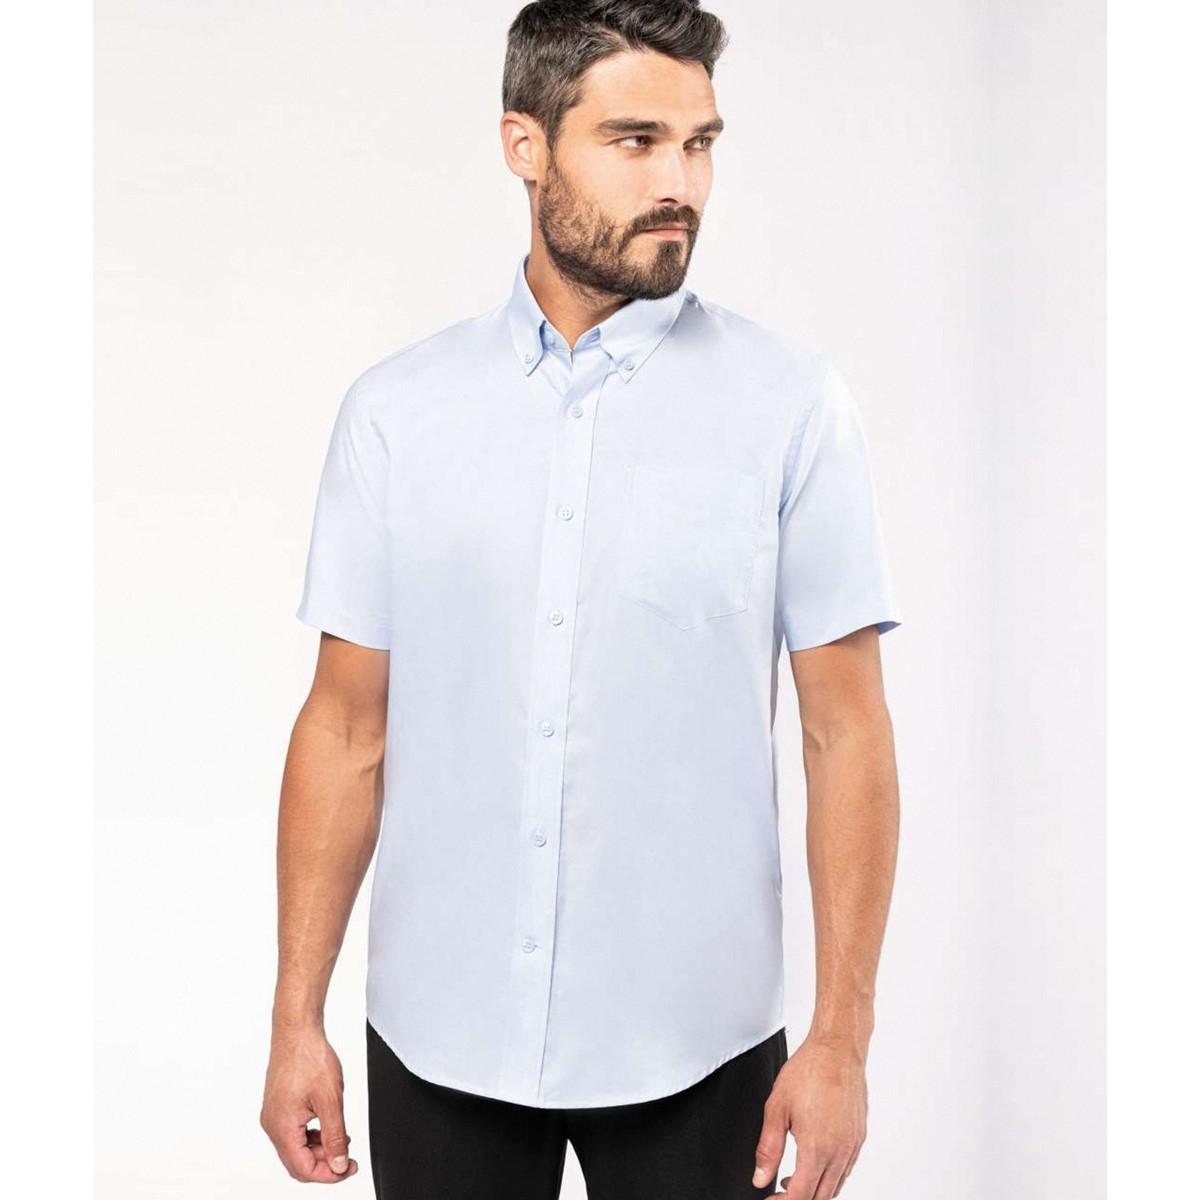 Kariban Mens Short Sleeve Easy Care Oxford Shirt